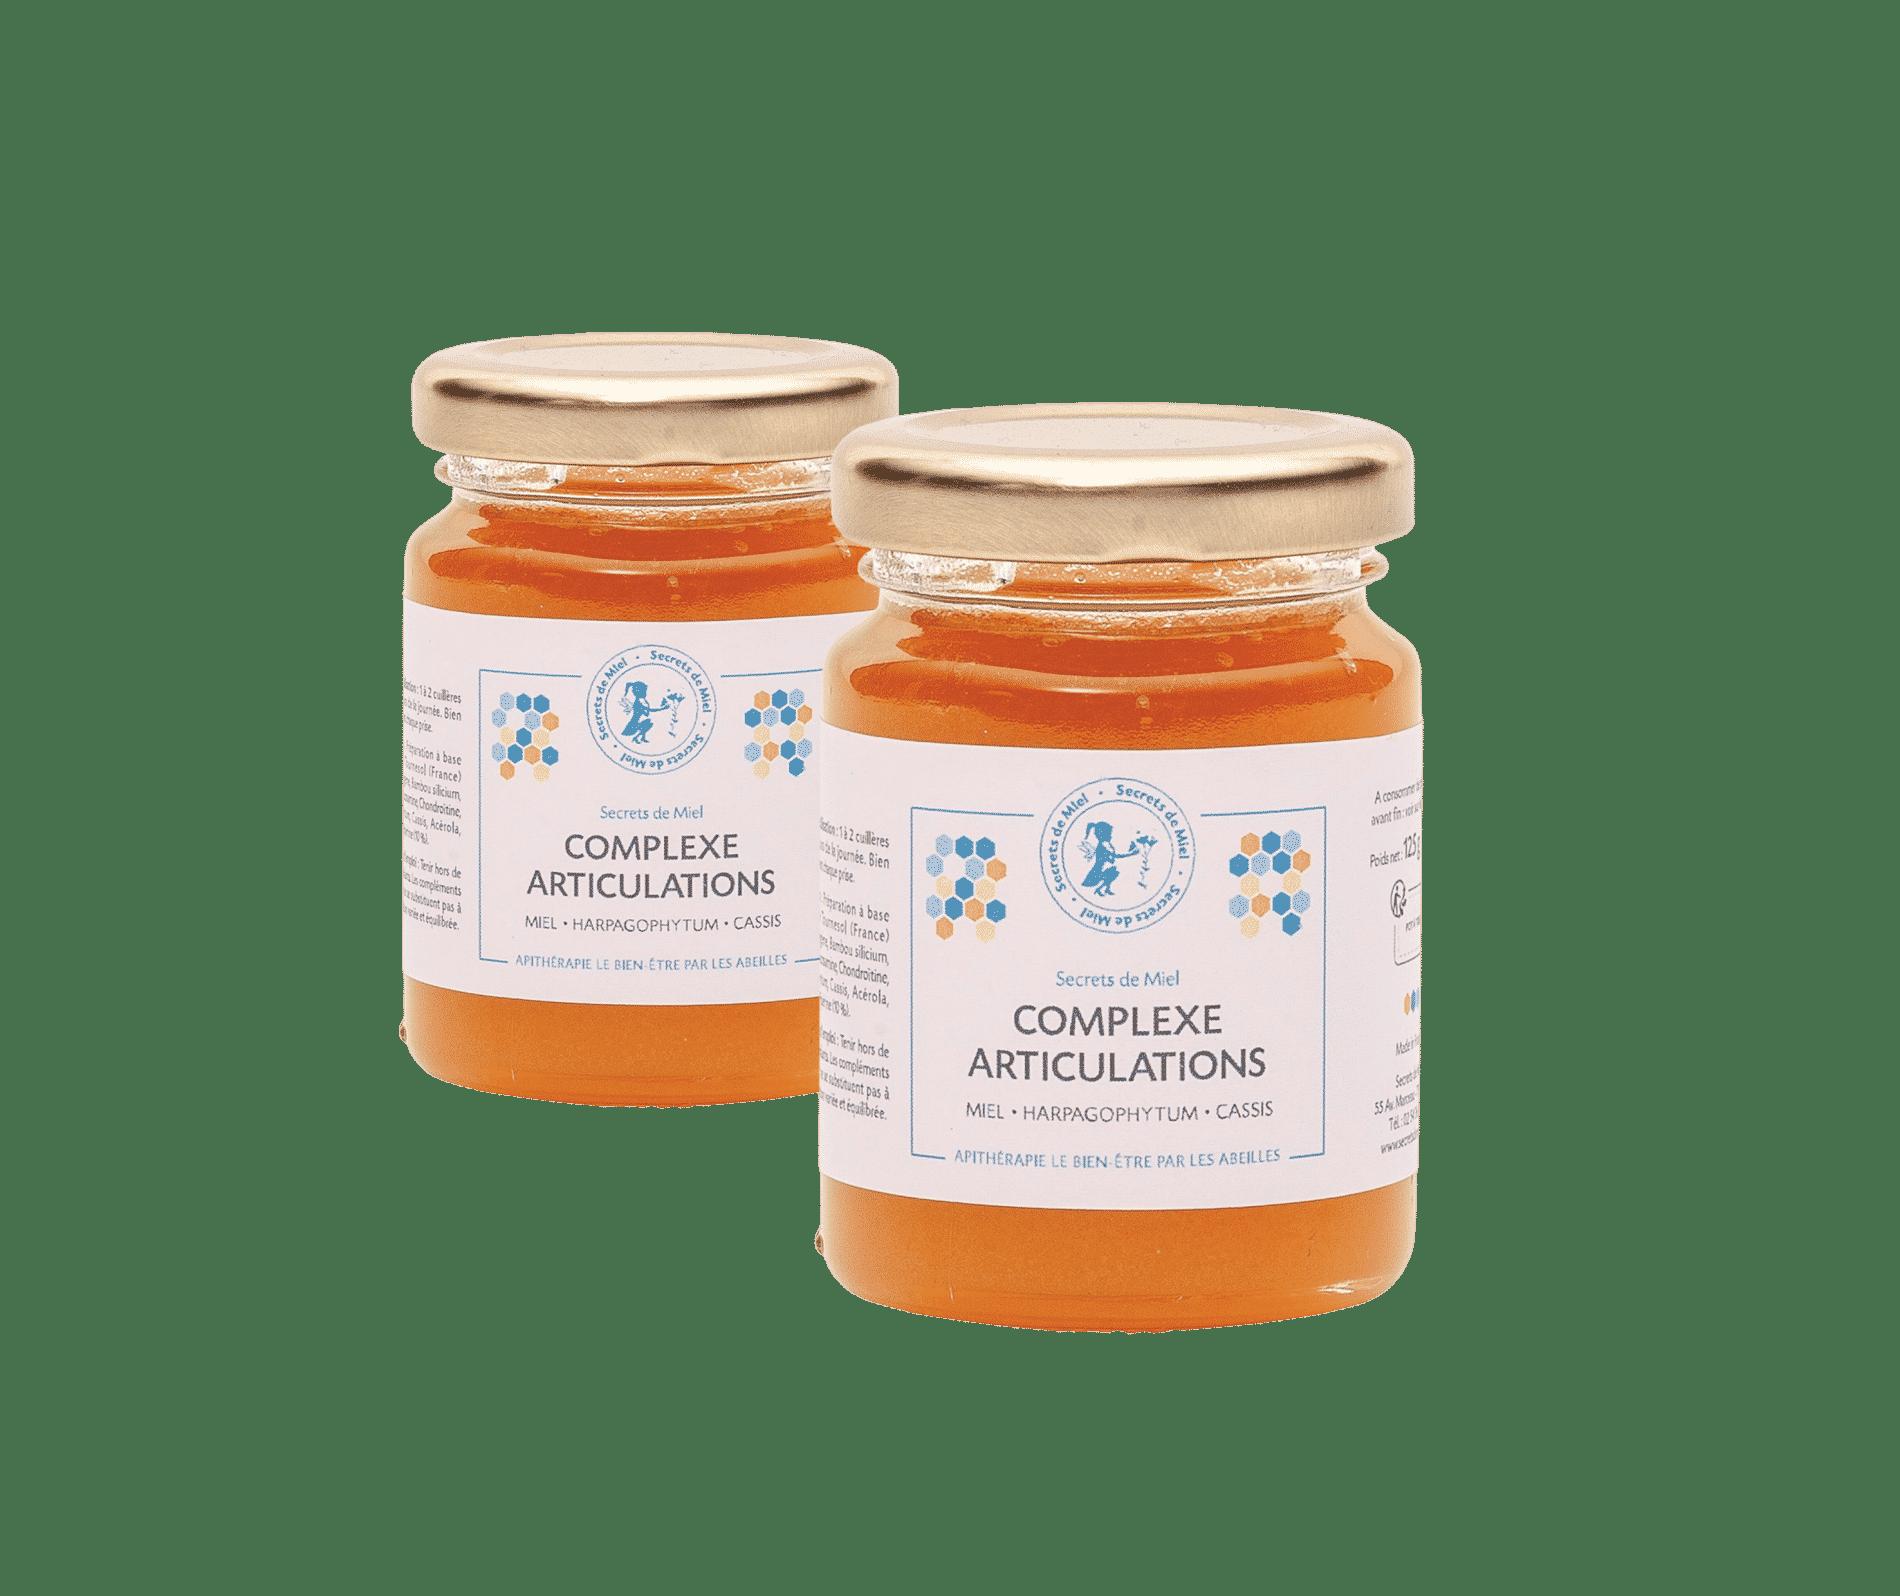 Secrets de Miel - produits naturels articulations - miel et plantes - articulations douloureuses